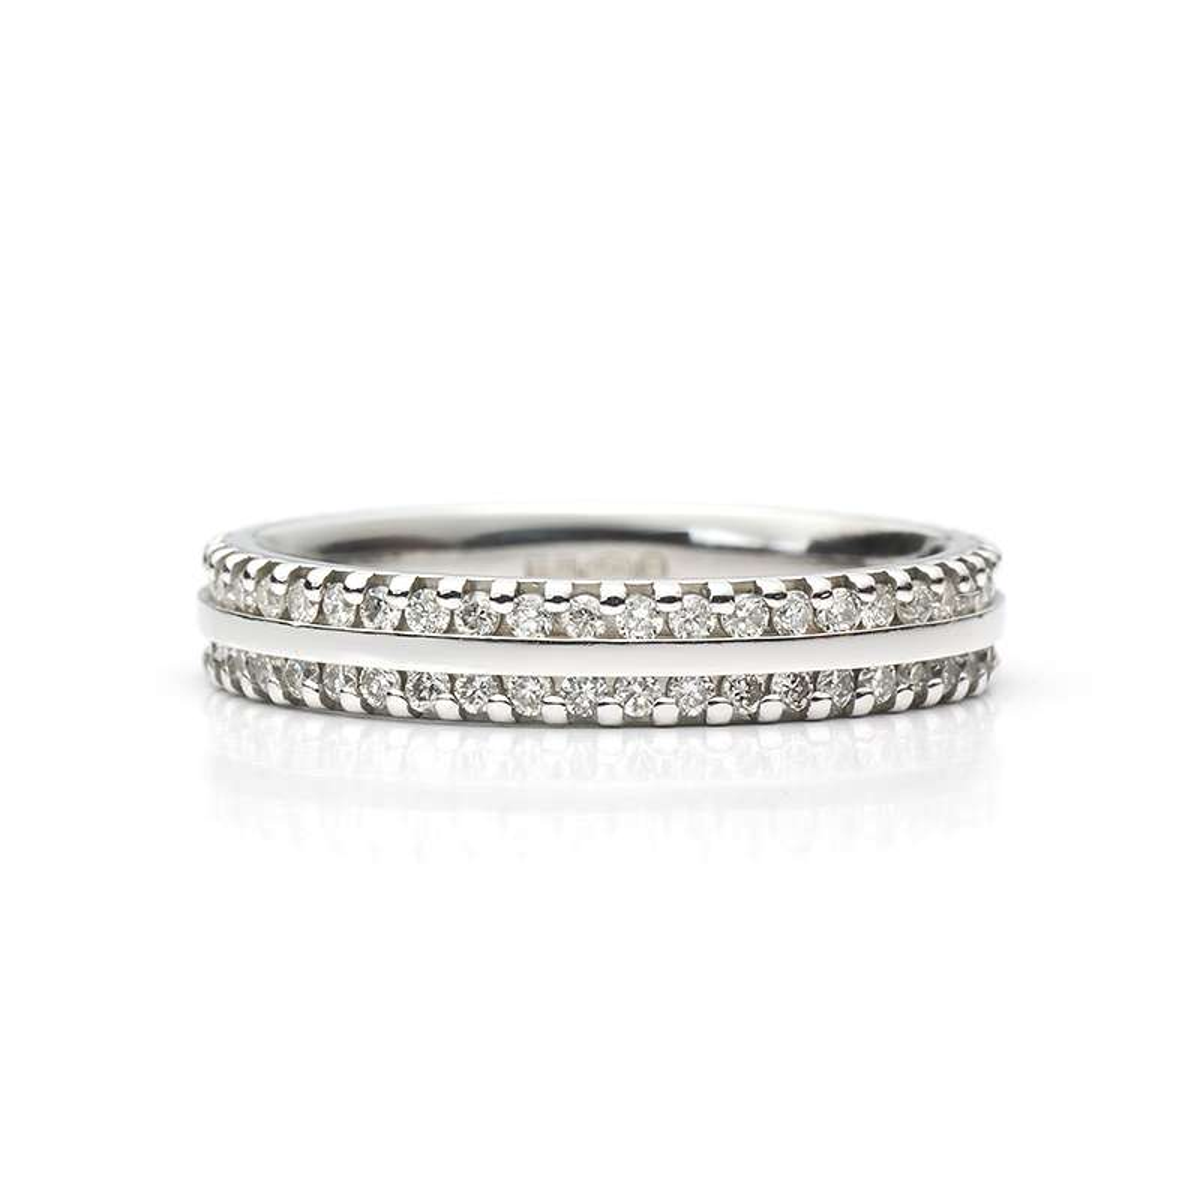 Diamond 2 Row Full Eternity Ring in Platinum 0.53ct